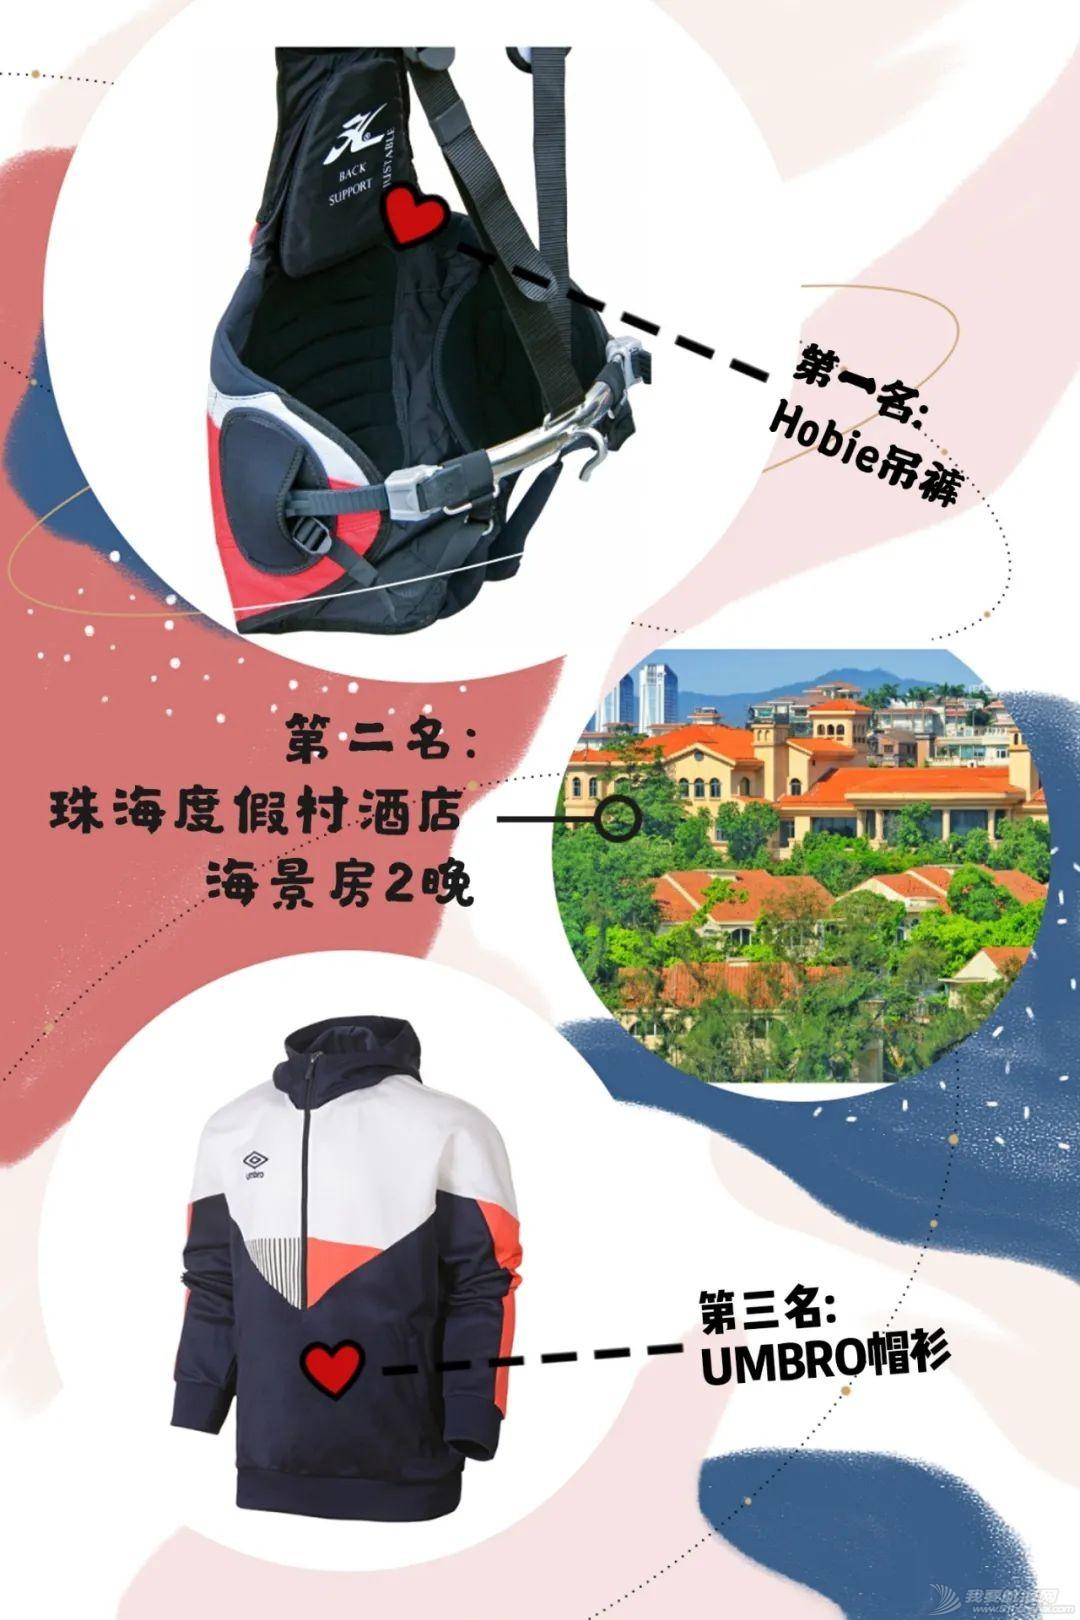 Battle海上飞行员,好胆你就来!中国帆船线上冠军挑战赛第二期Hobie Getaway单边飞行挑战上线!w12.jpg